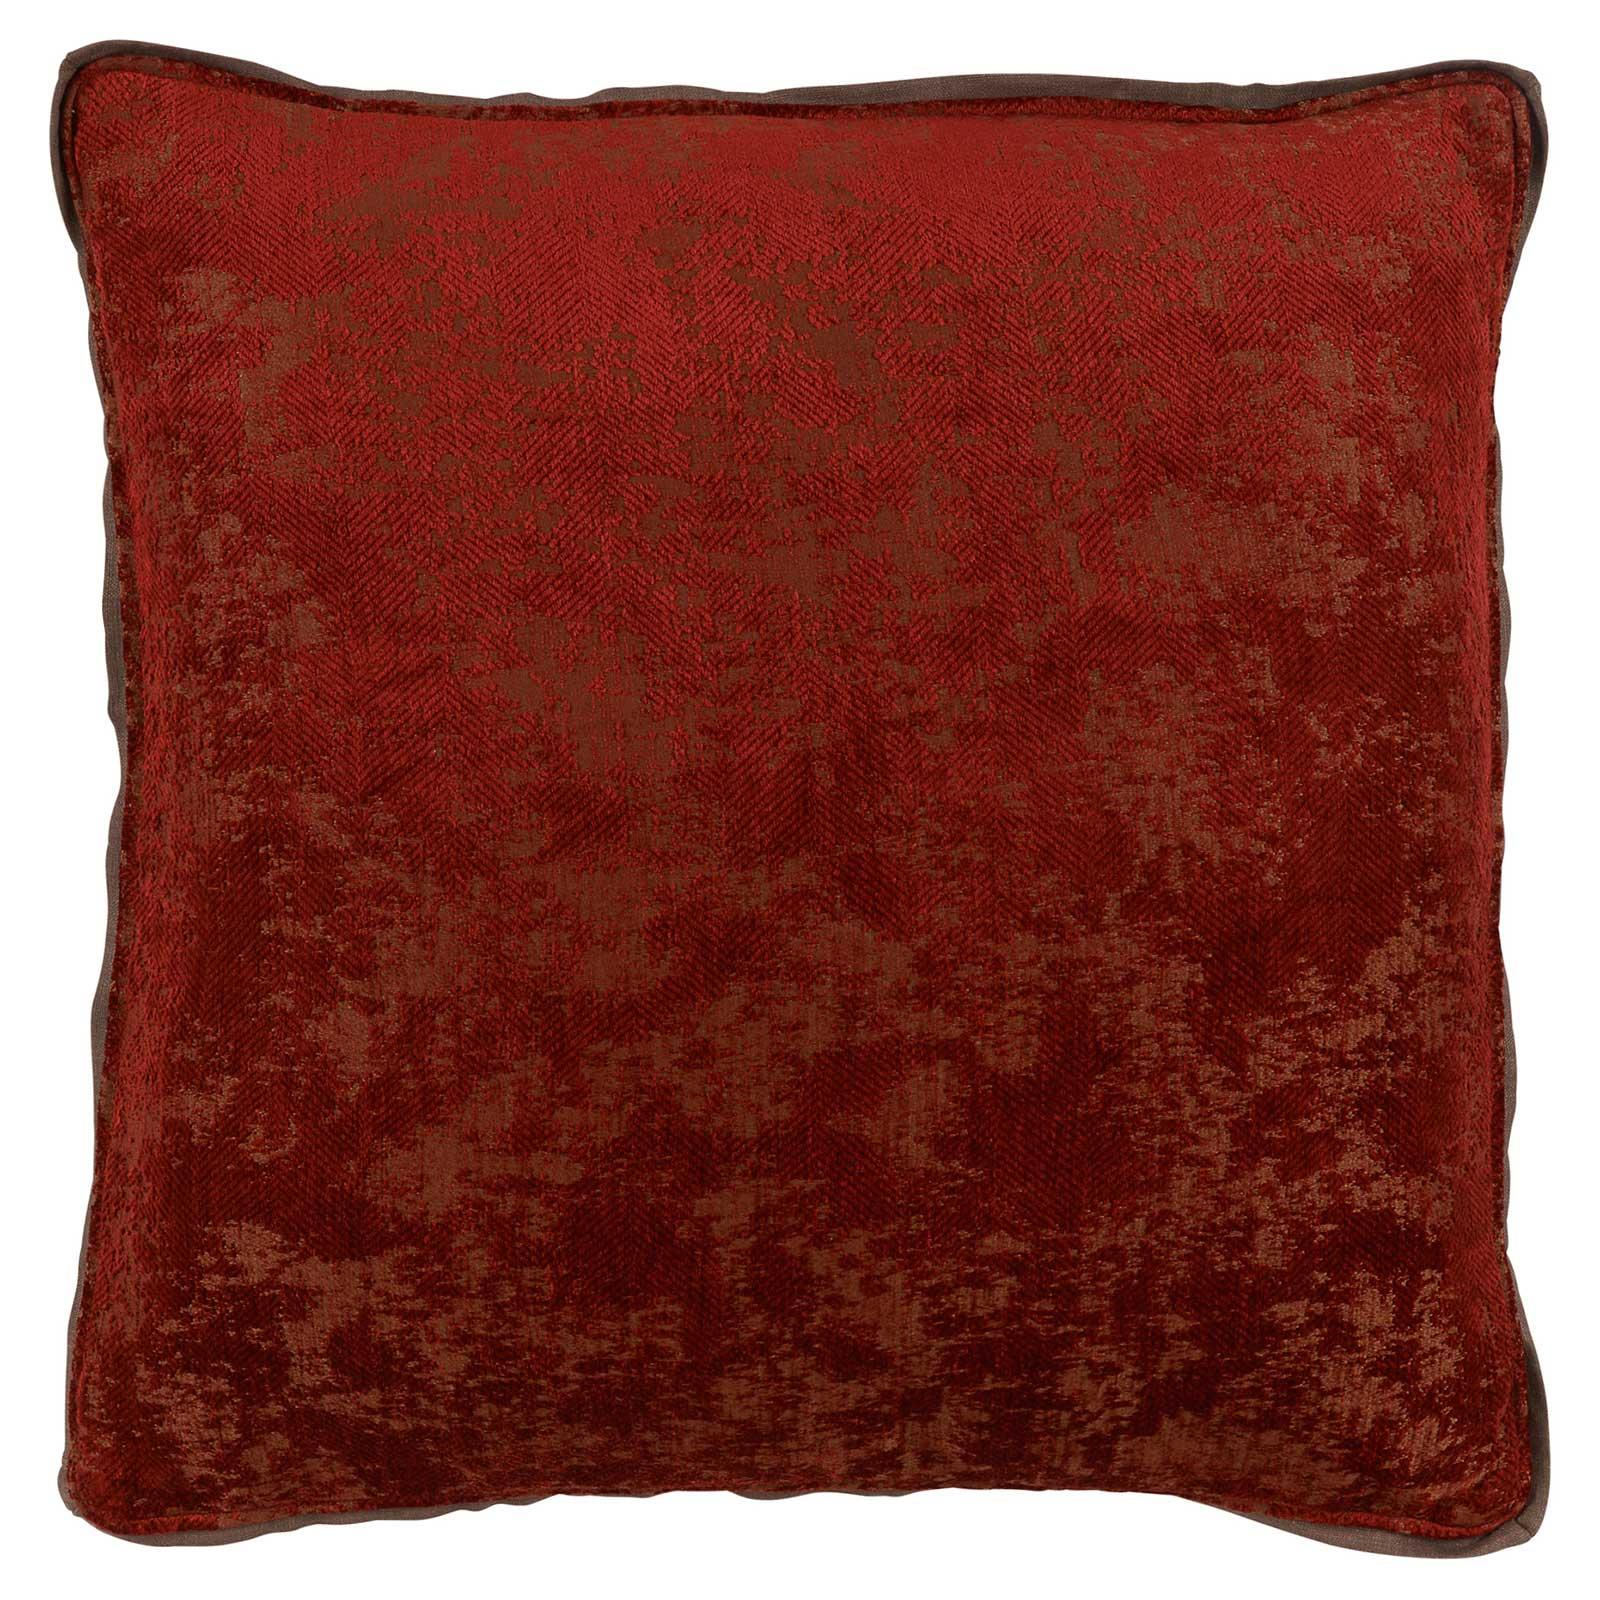 Harriet Regency Washed Herringbone Brown Pillow - 22x22